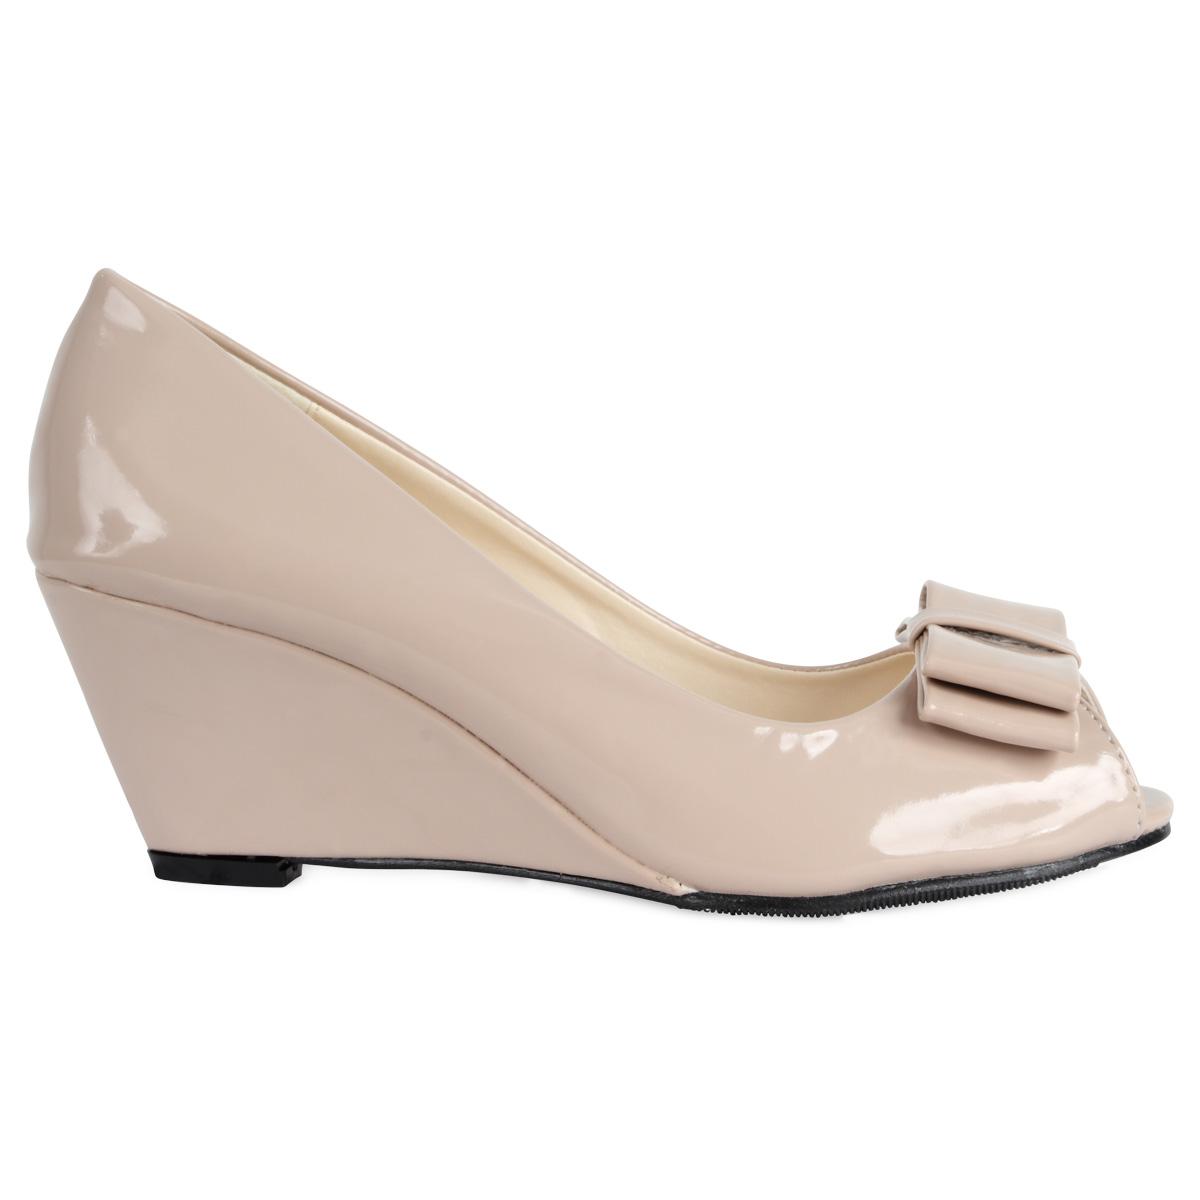 Buy Panama Wedge Heel Court Shoes - Nude Patent